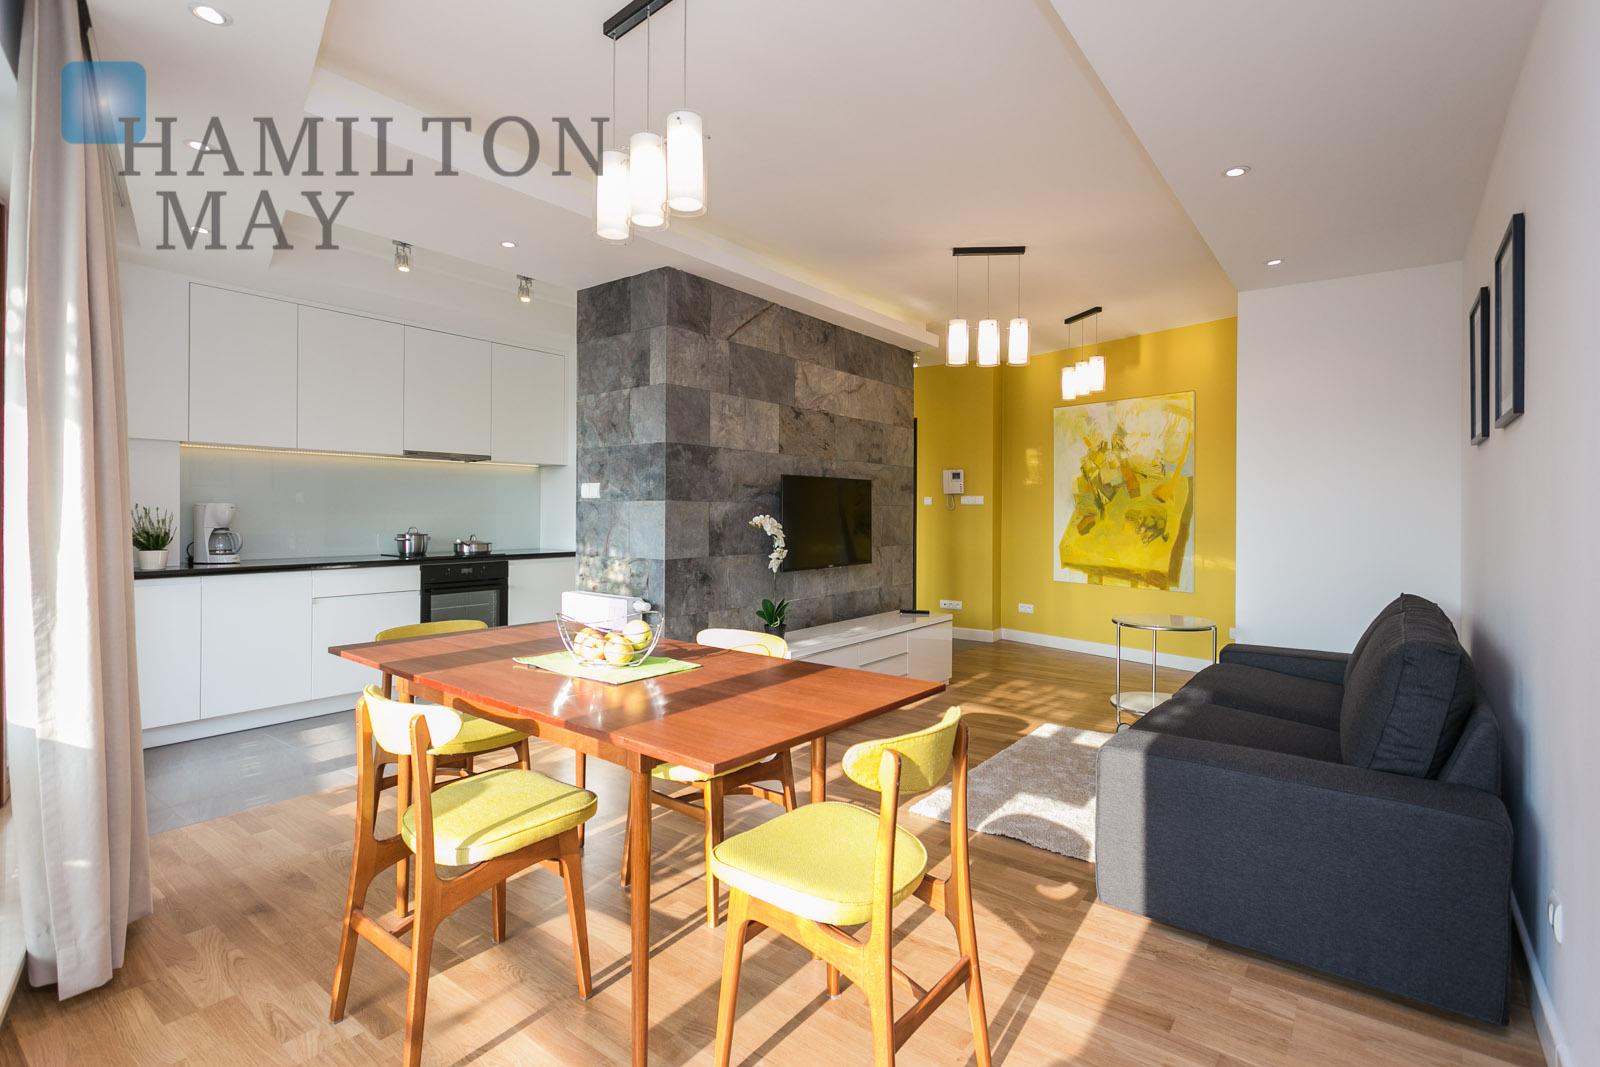 Sunny One Bedroom Apartment In Oxygen Development Wronia Warszawa For Rental Ref 4932 Hamilton May